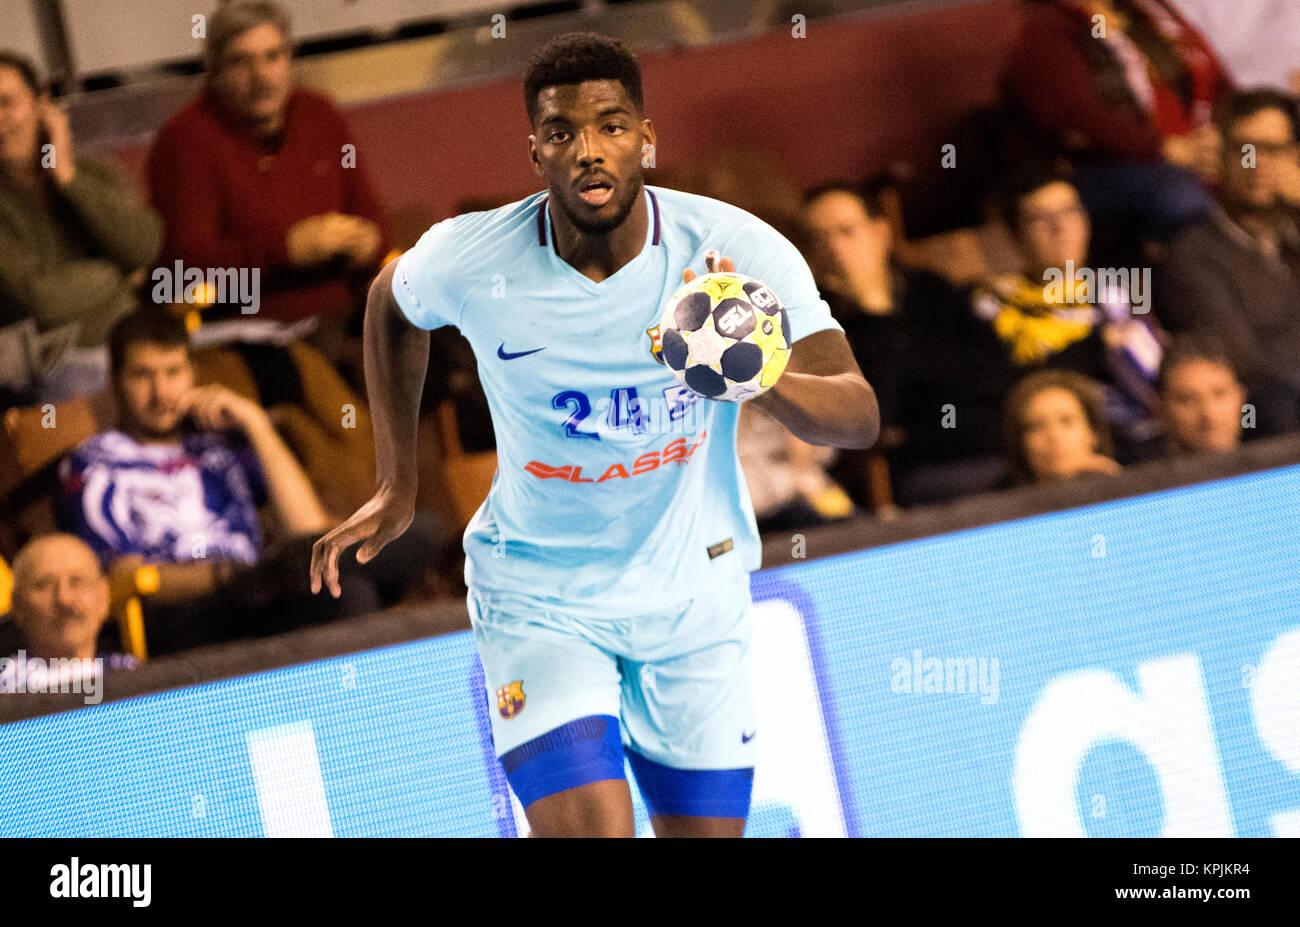 Leon, Spain. 16th December, 2017. Dika Mem (FC Barcelona) in action during the handball match of 2017/2018 Spanish - Stock Image